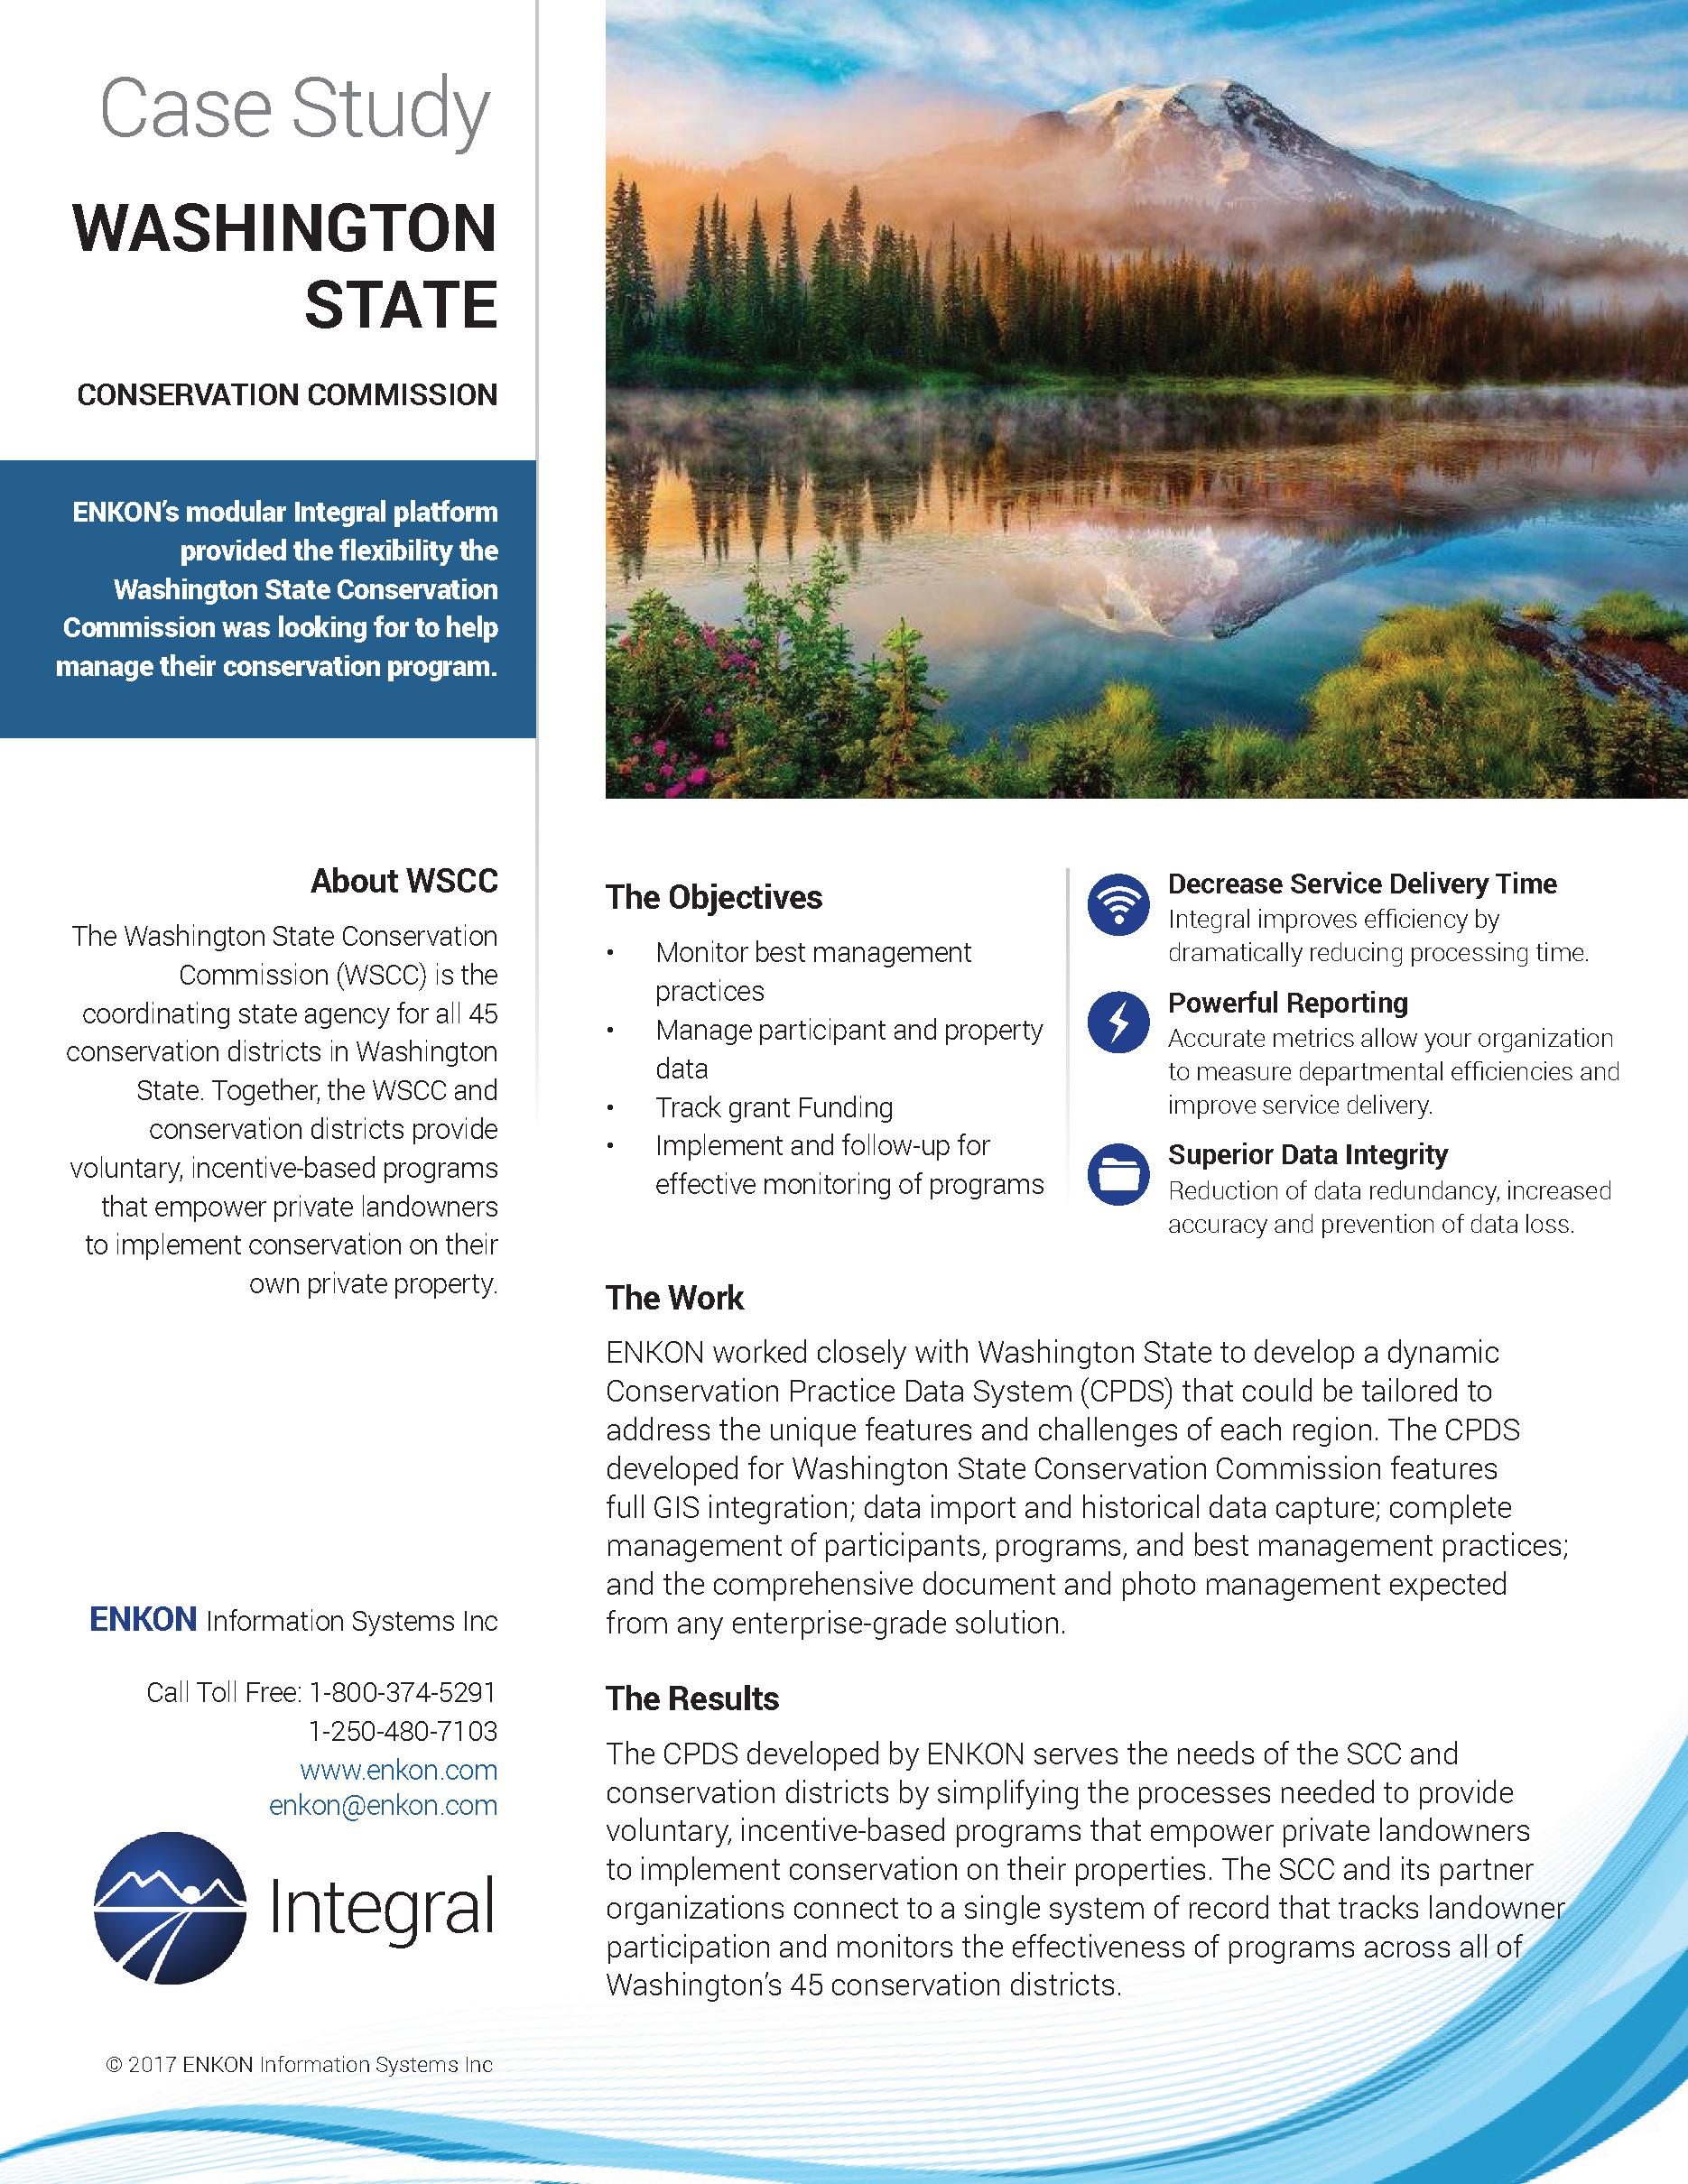 Washington State Conservation Commission 1.0